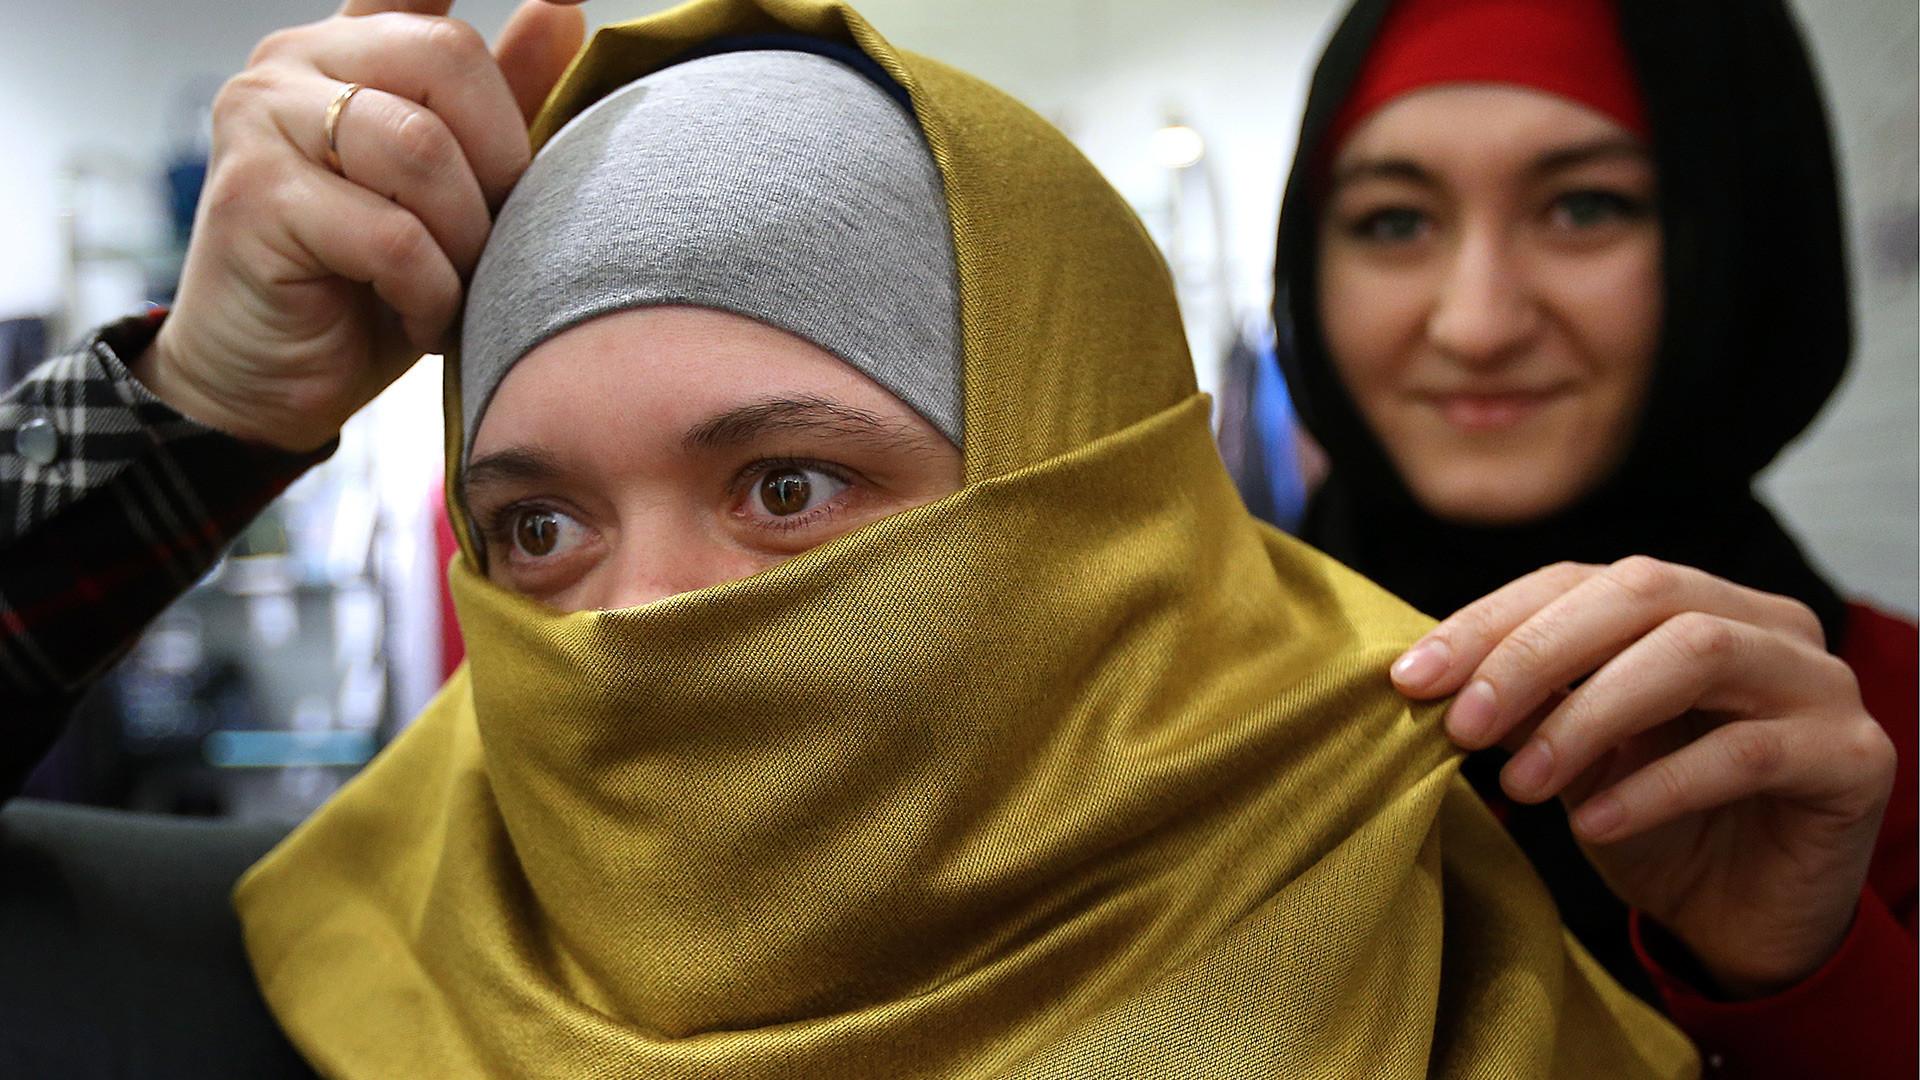 Seorang perempuan tengah memilih jilbab di pusat perbelanjaan Moskow.